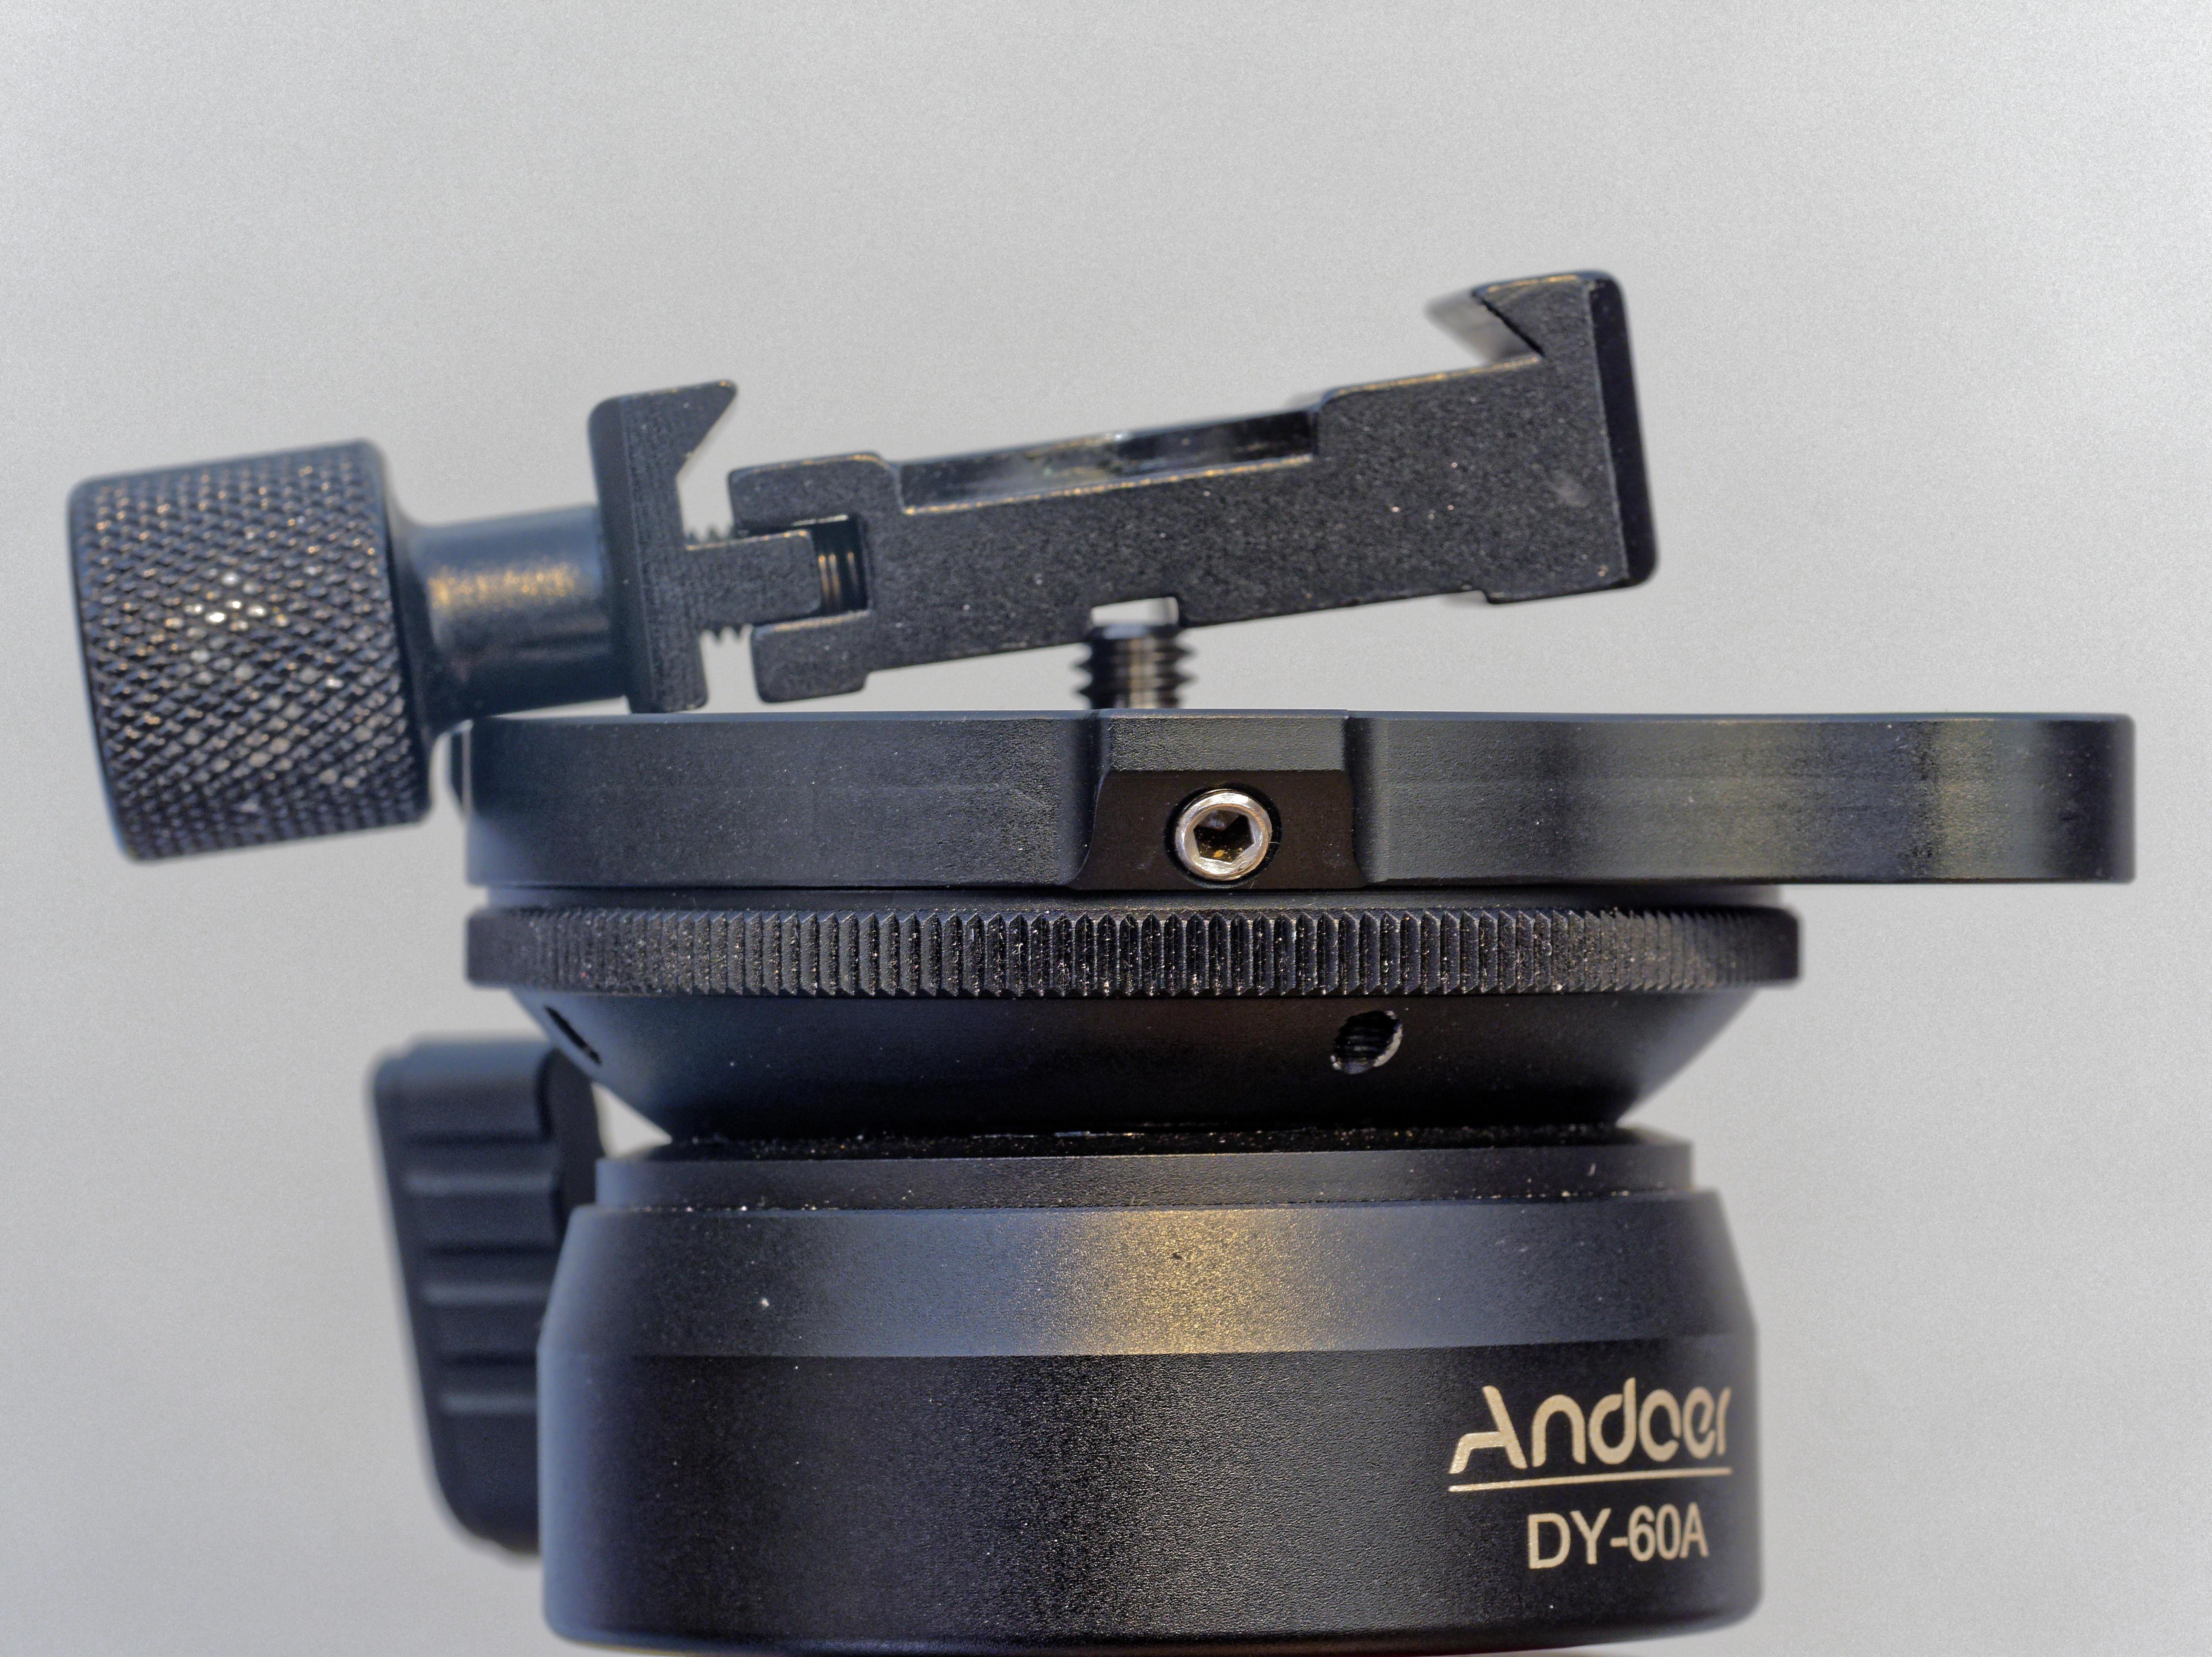 Camera-mounts-3.jpeg